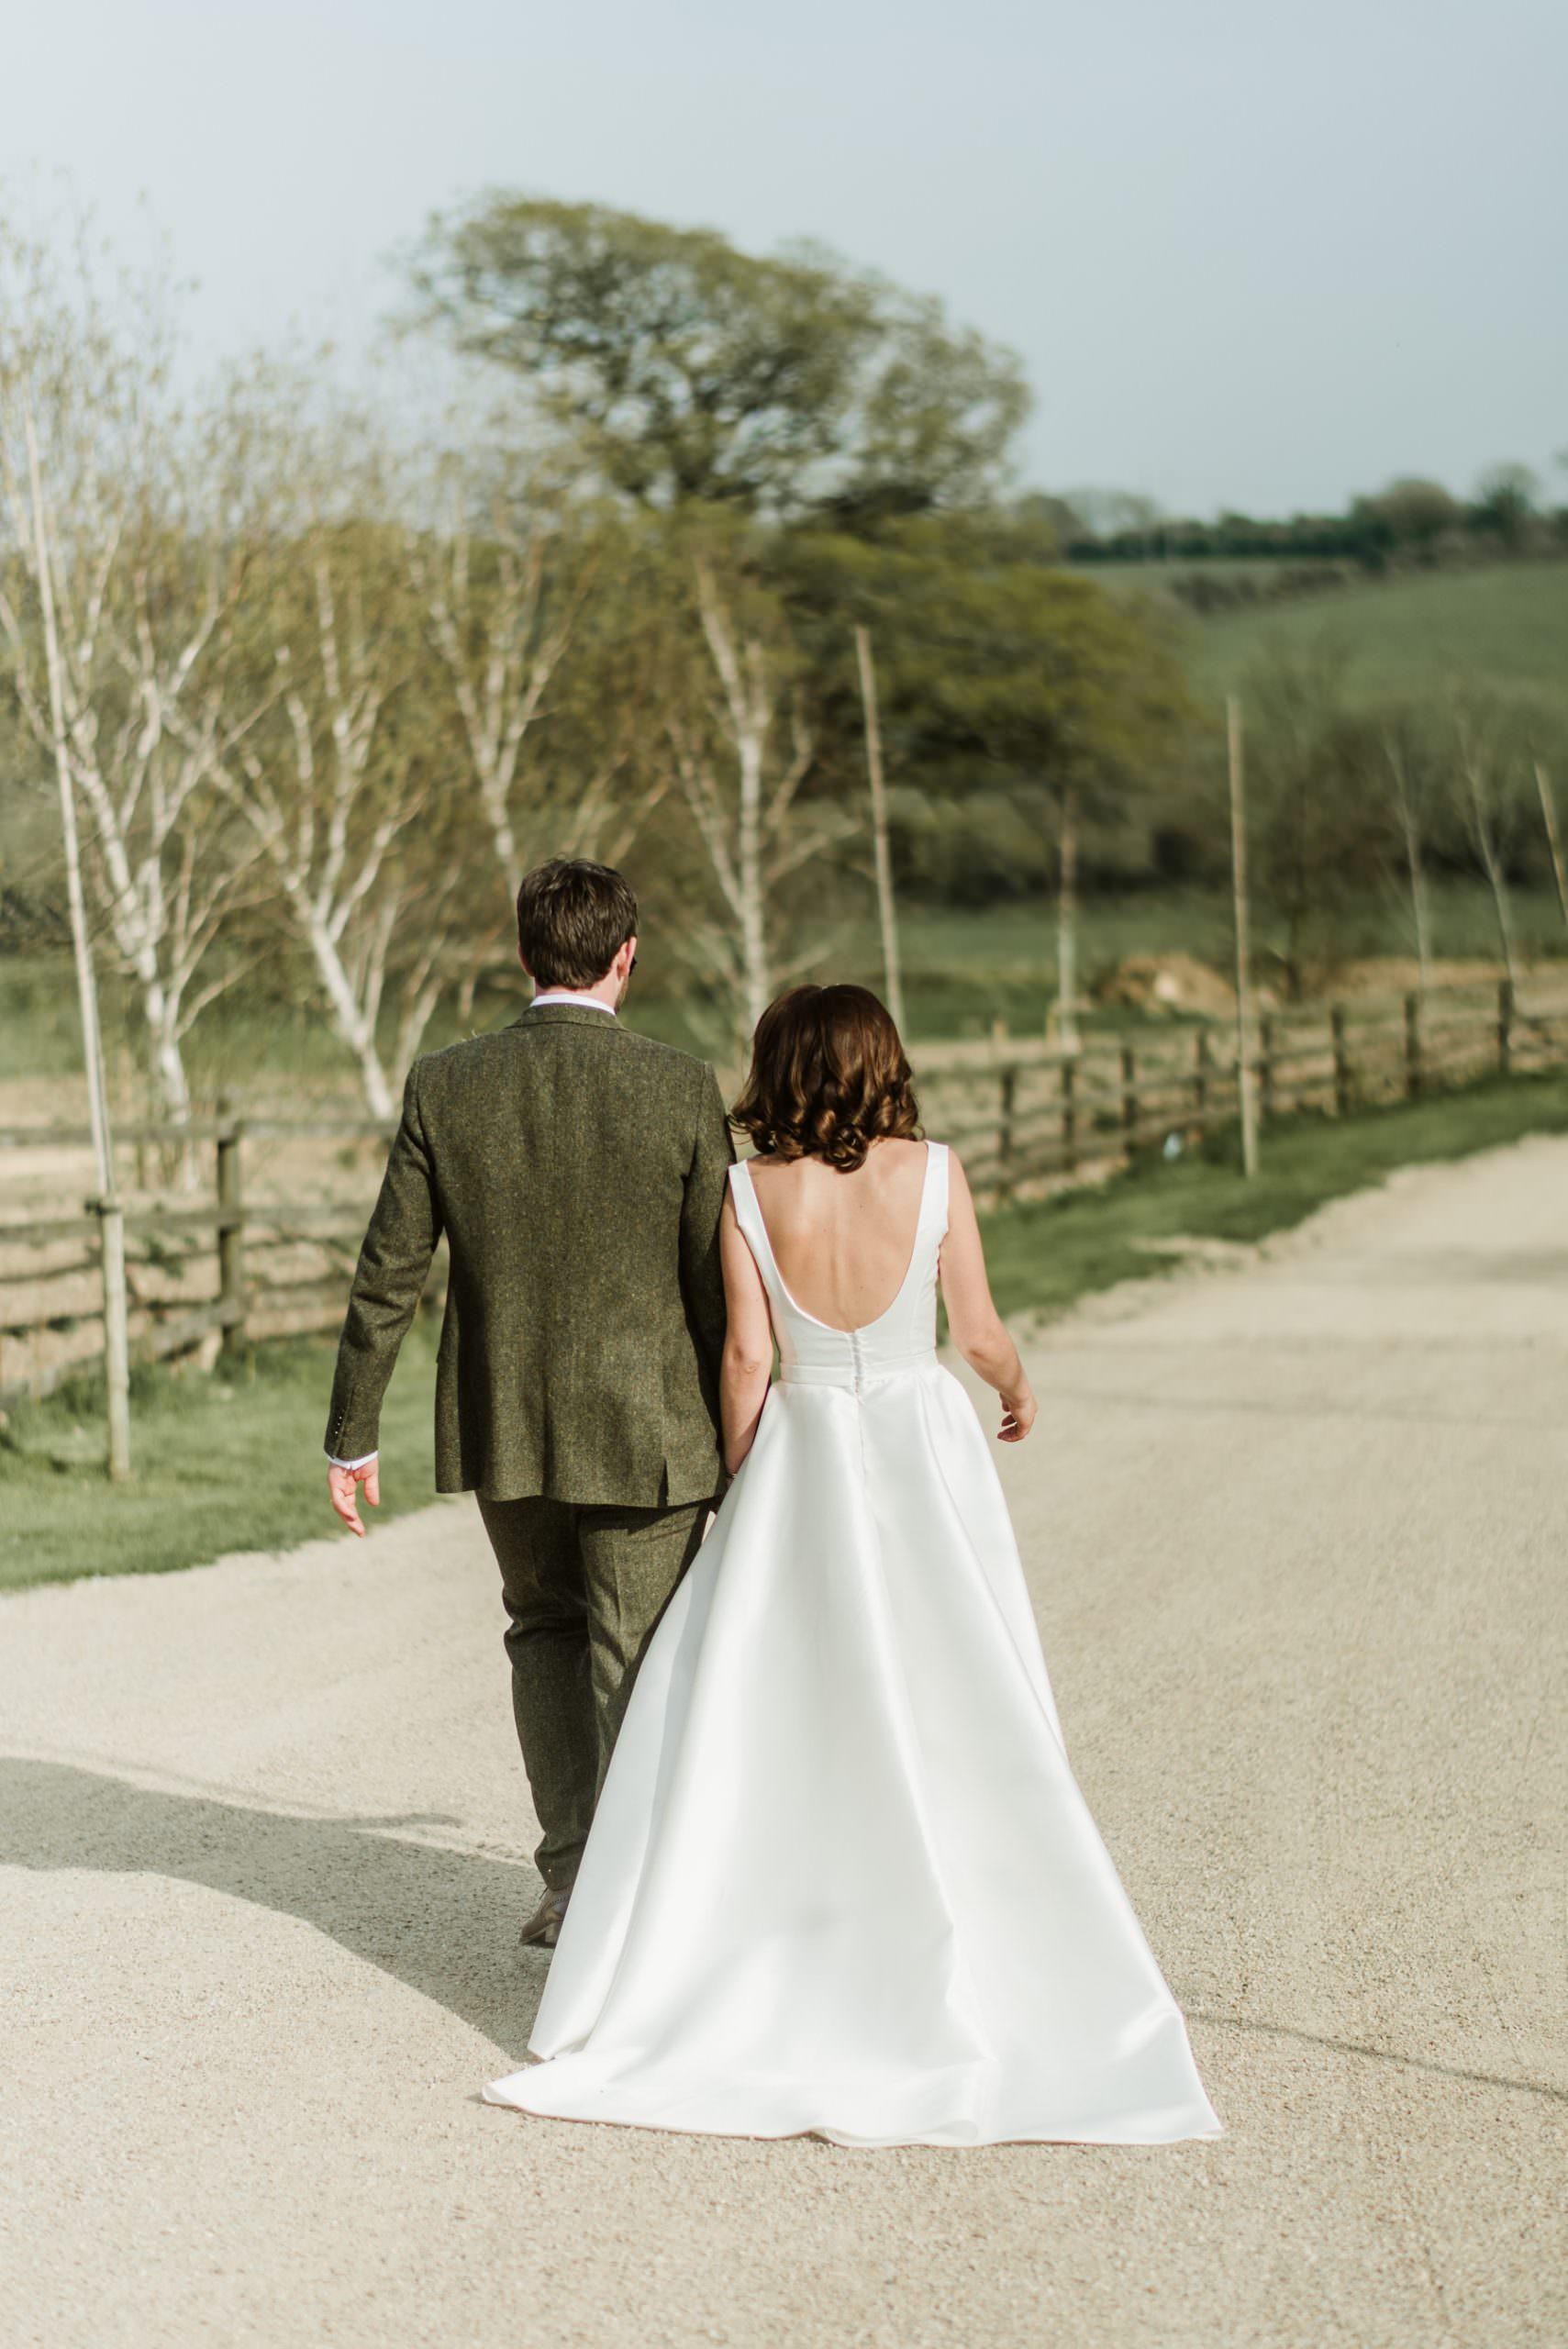 darek novak photography, best ireland photographer,wedding photos horetown house